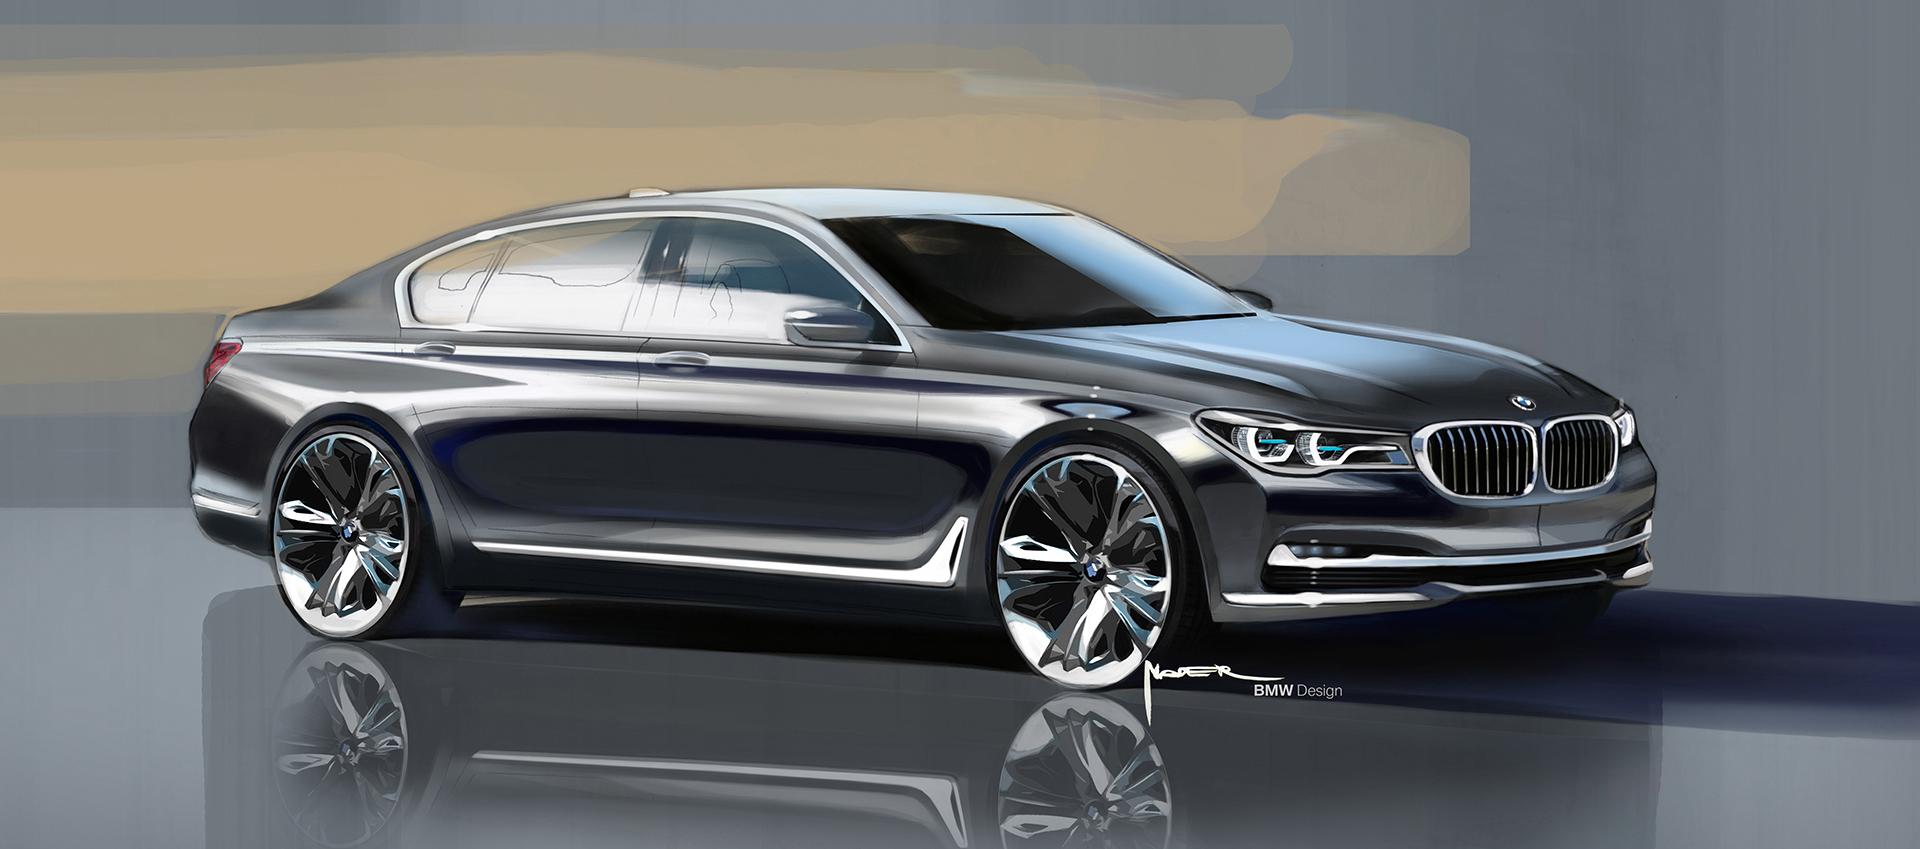 BMW 7 series - 2016 - sketch - profil avant / front